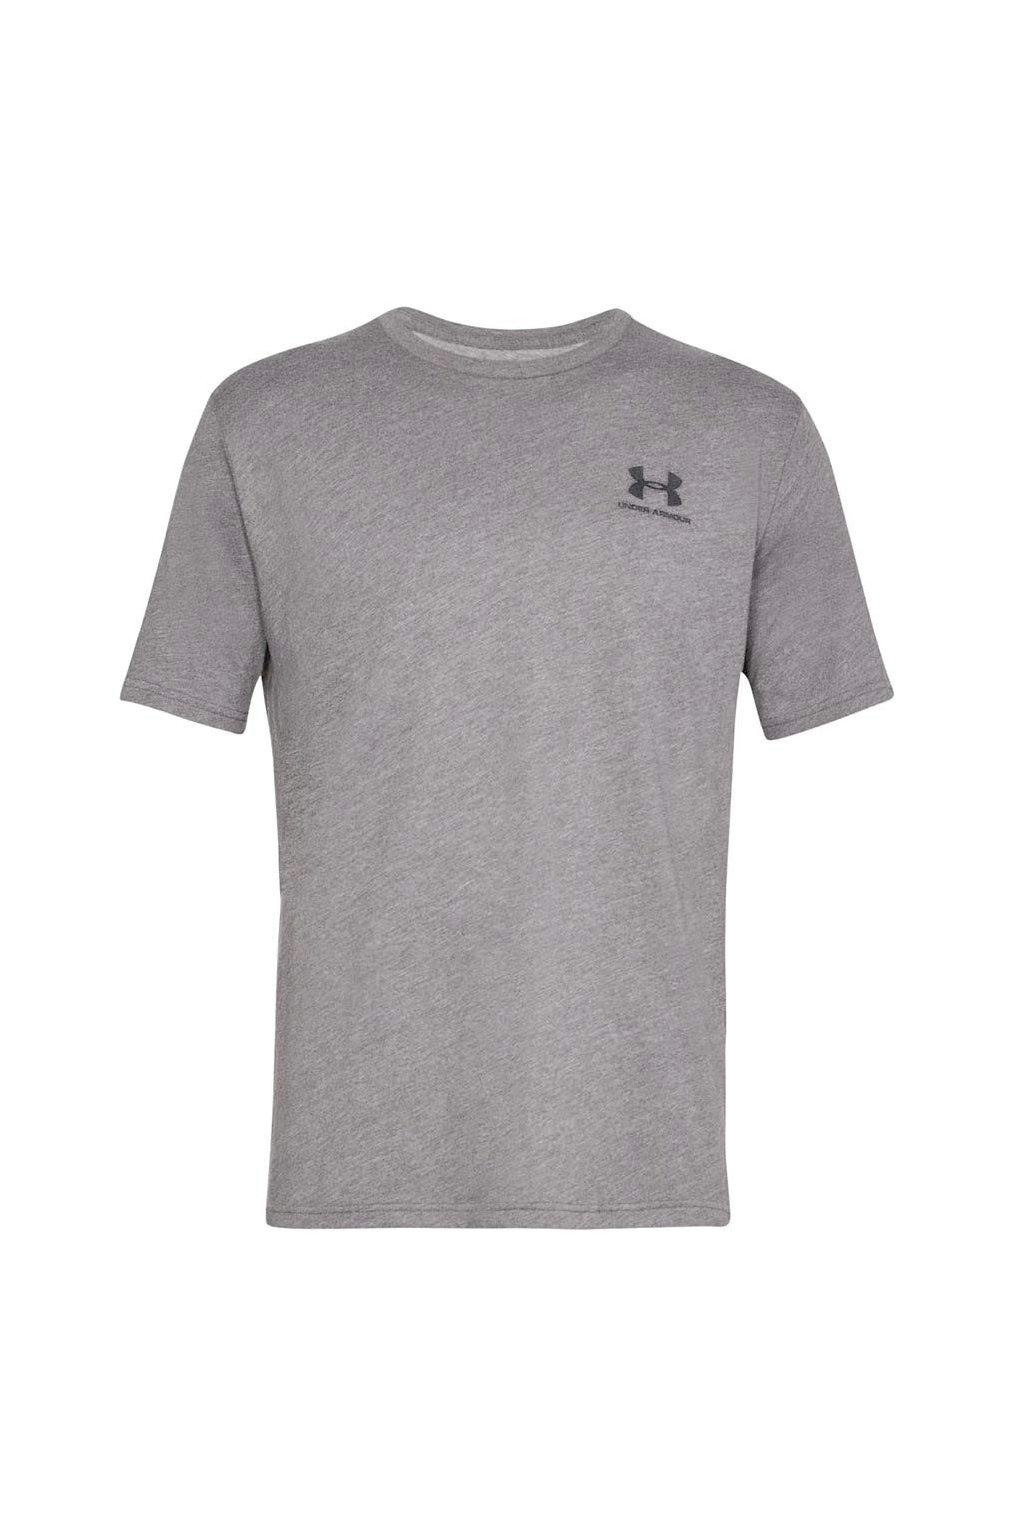 Pánske tričko Under Armour Sportstyle Left Chest SS šedá 1326799 036